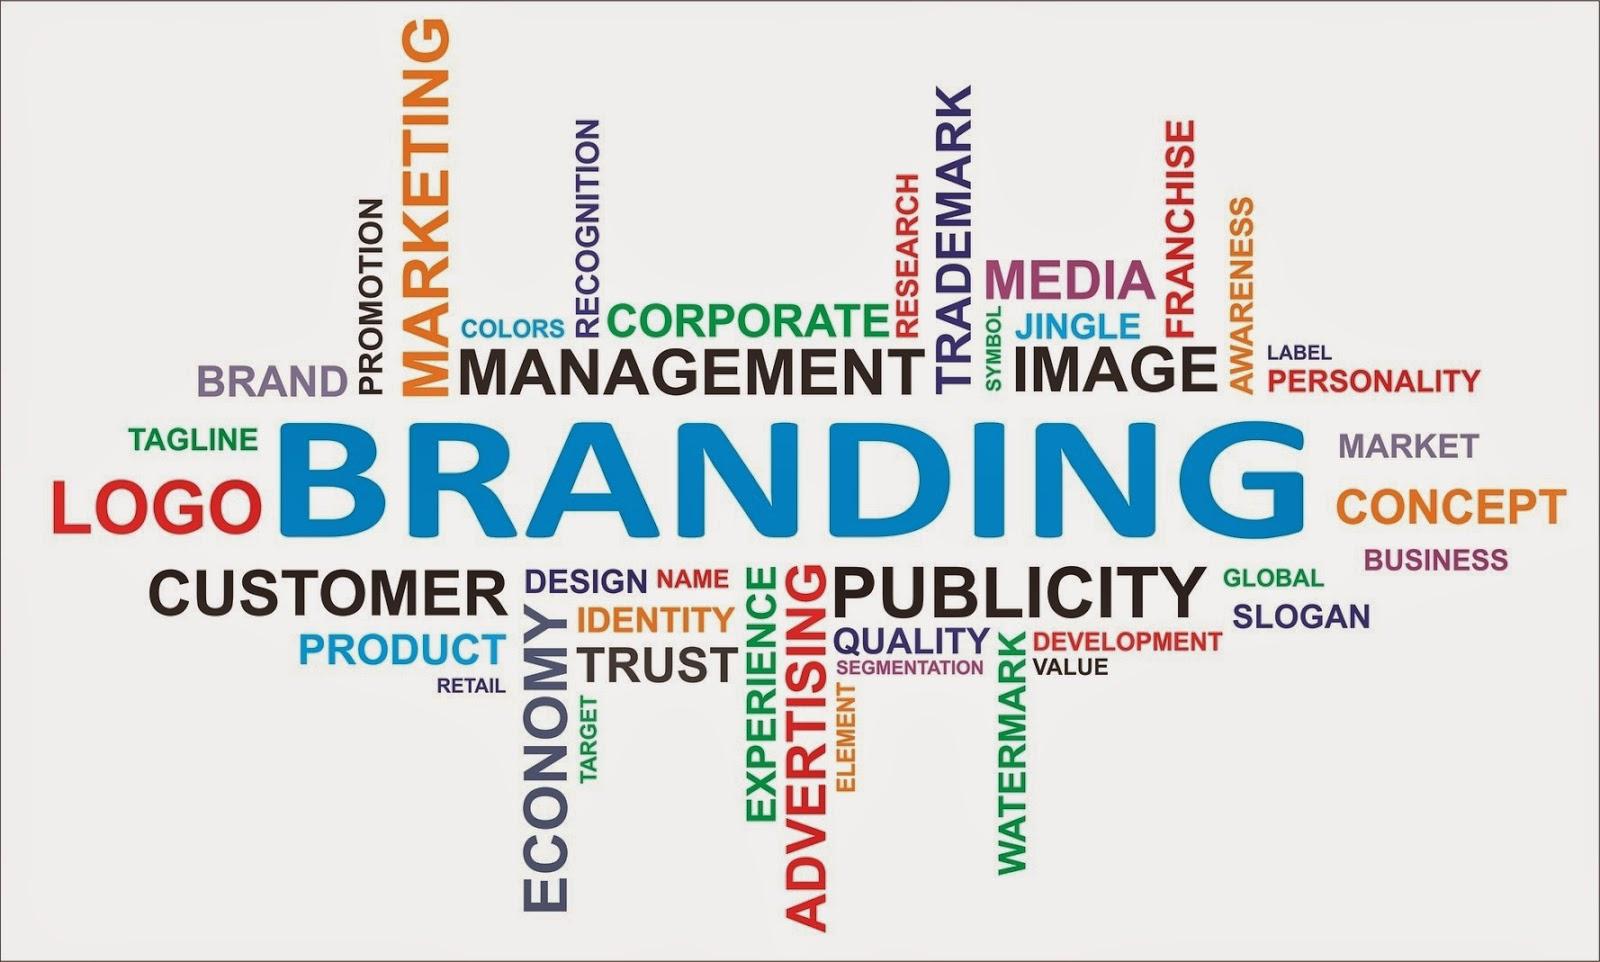 Branding awareness